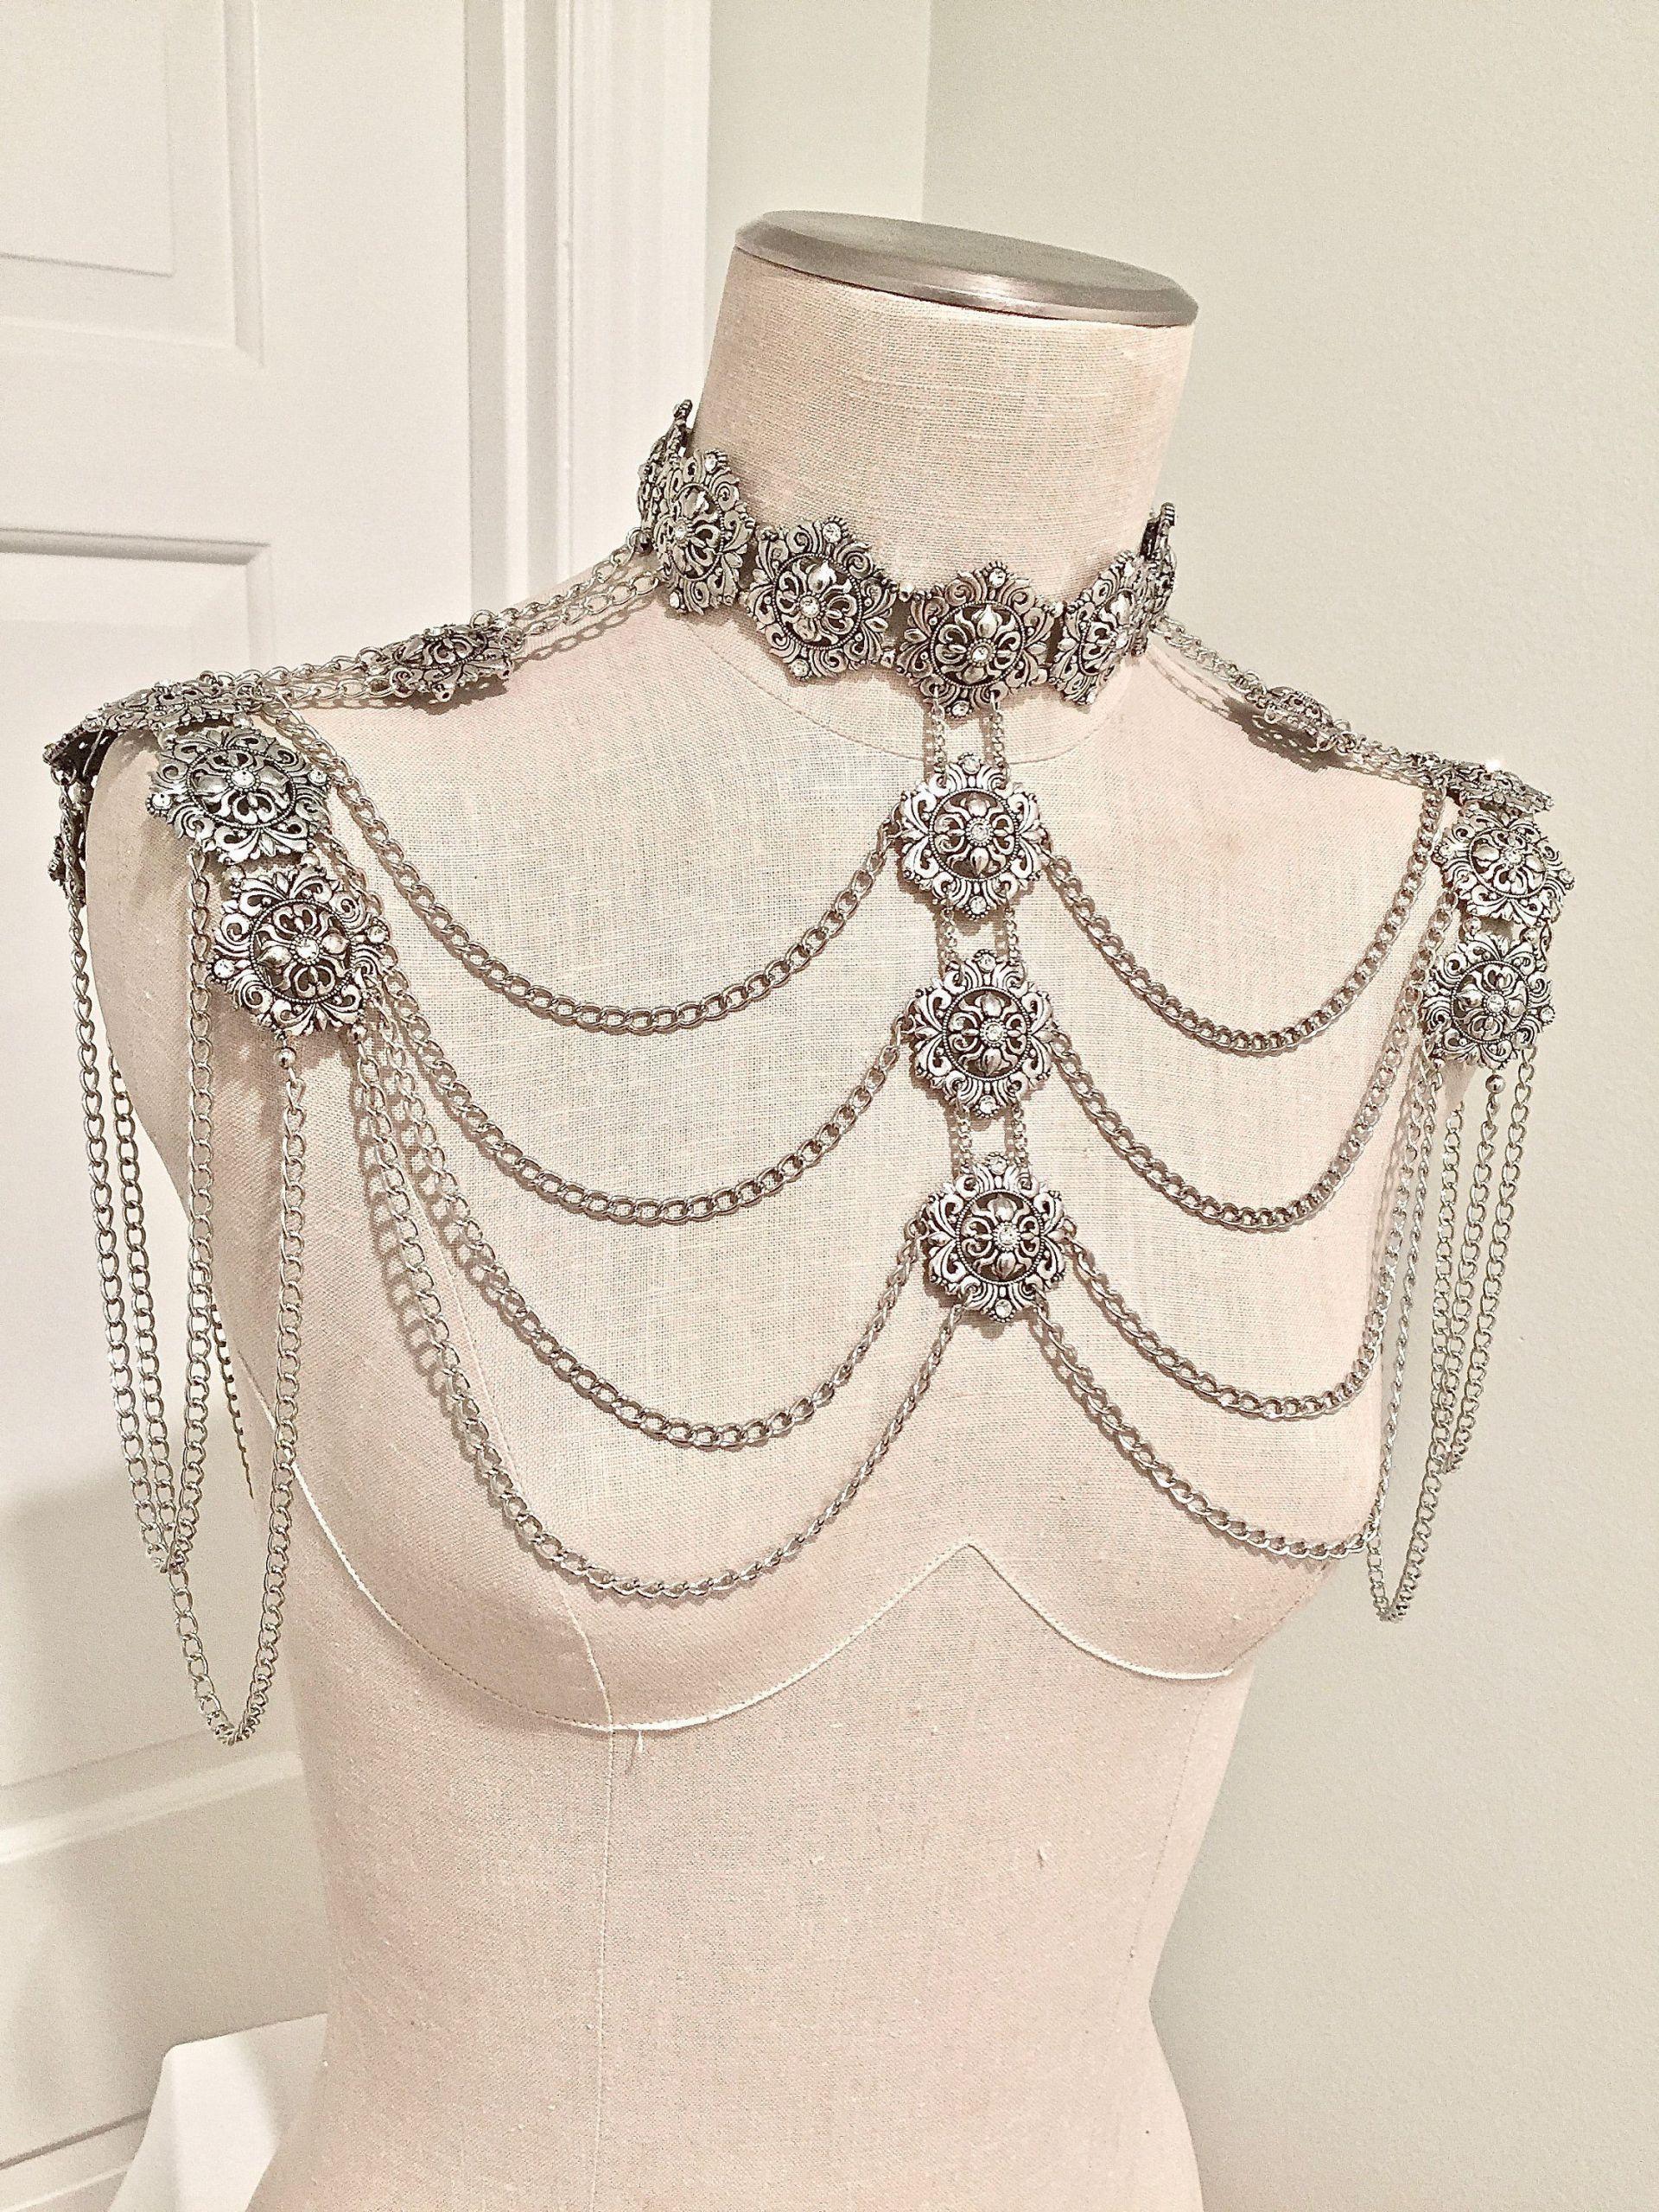 Body Jewelry Shoulder  Shoulder Chain Jewelry Choker Shoulder Necklace Body